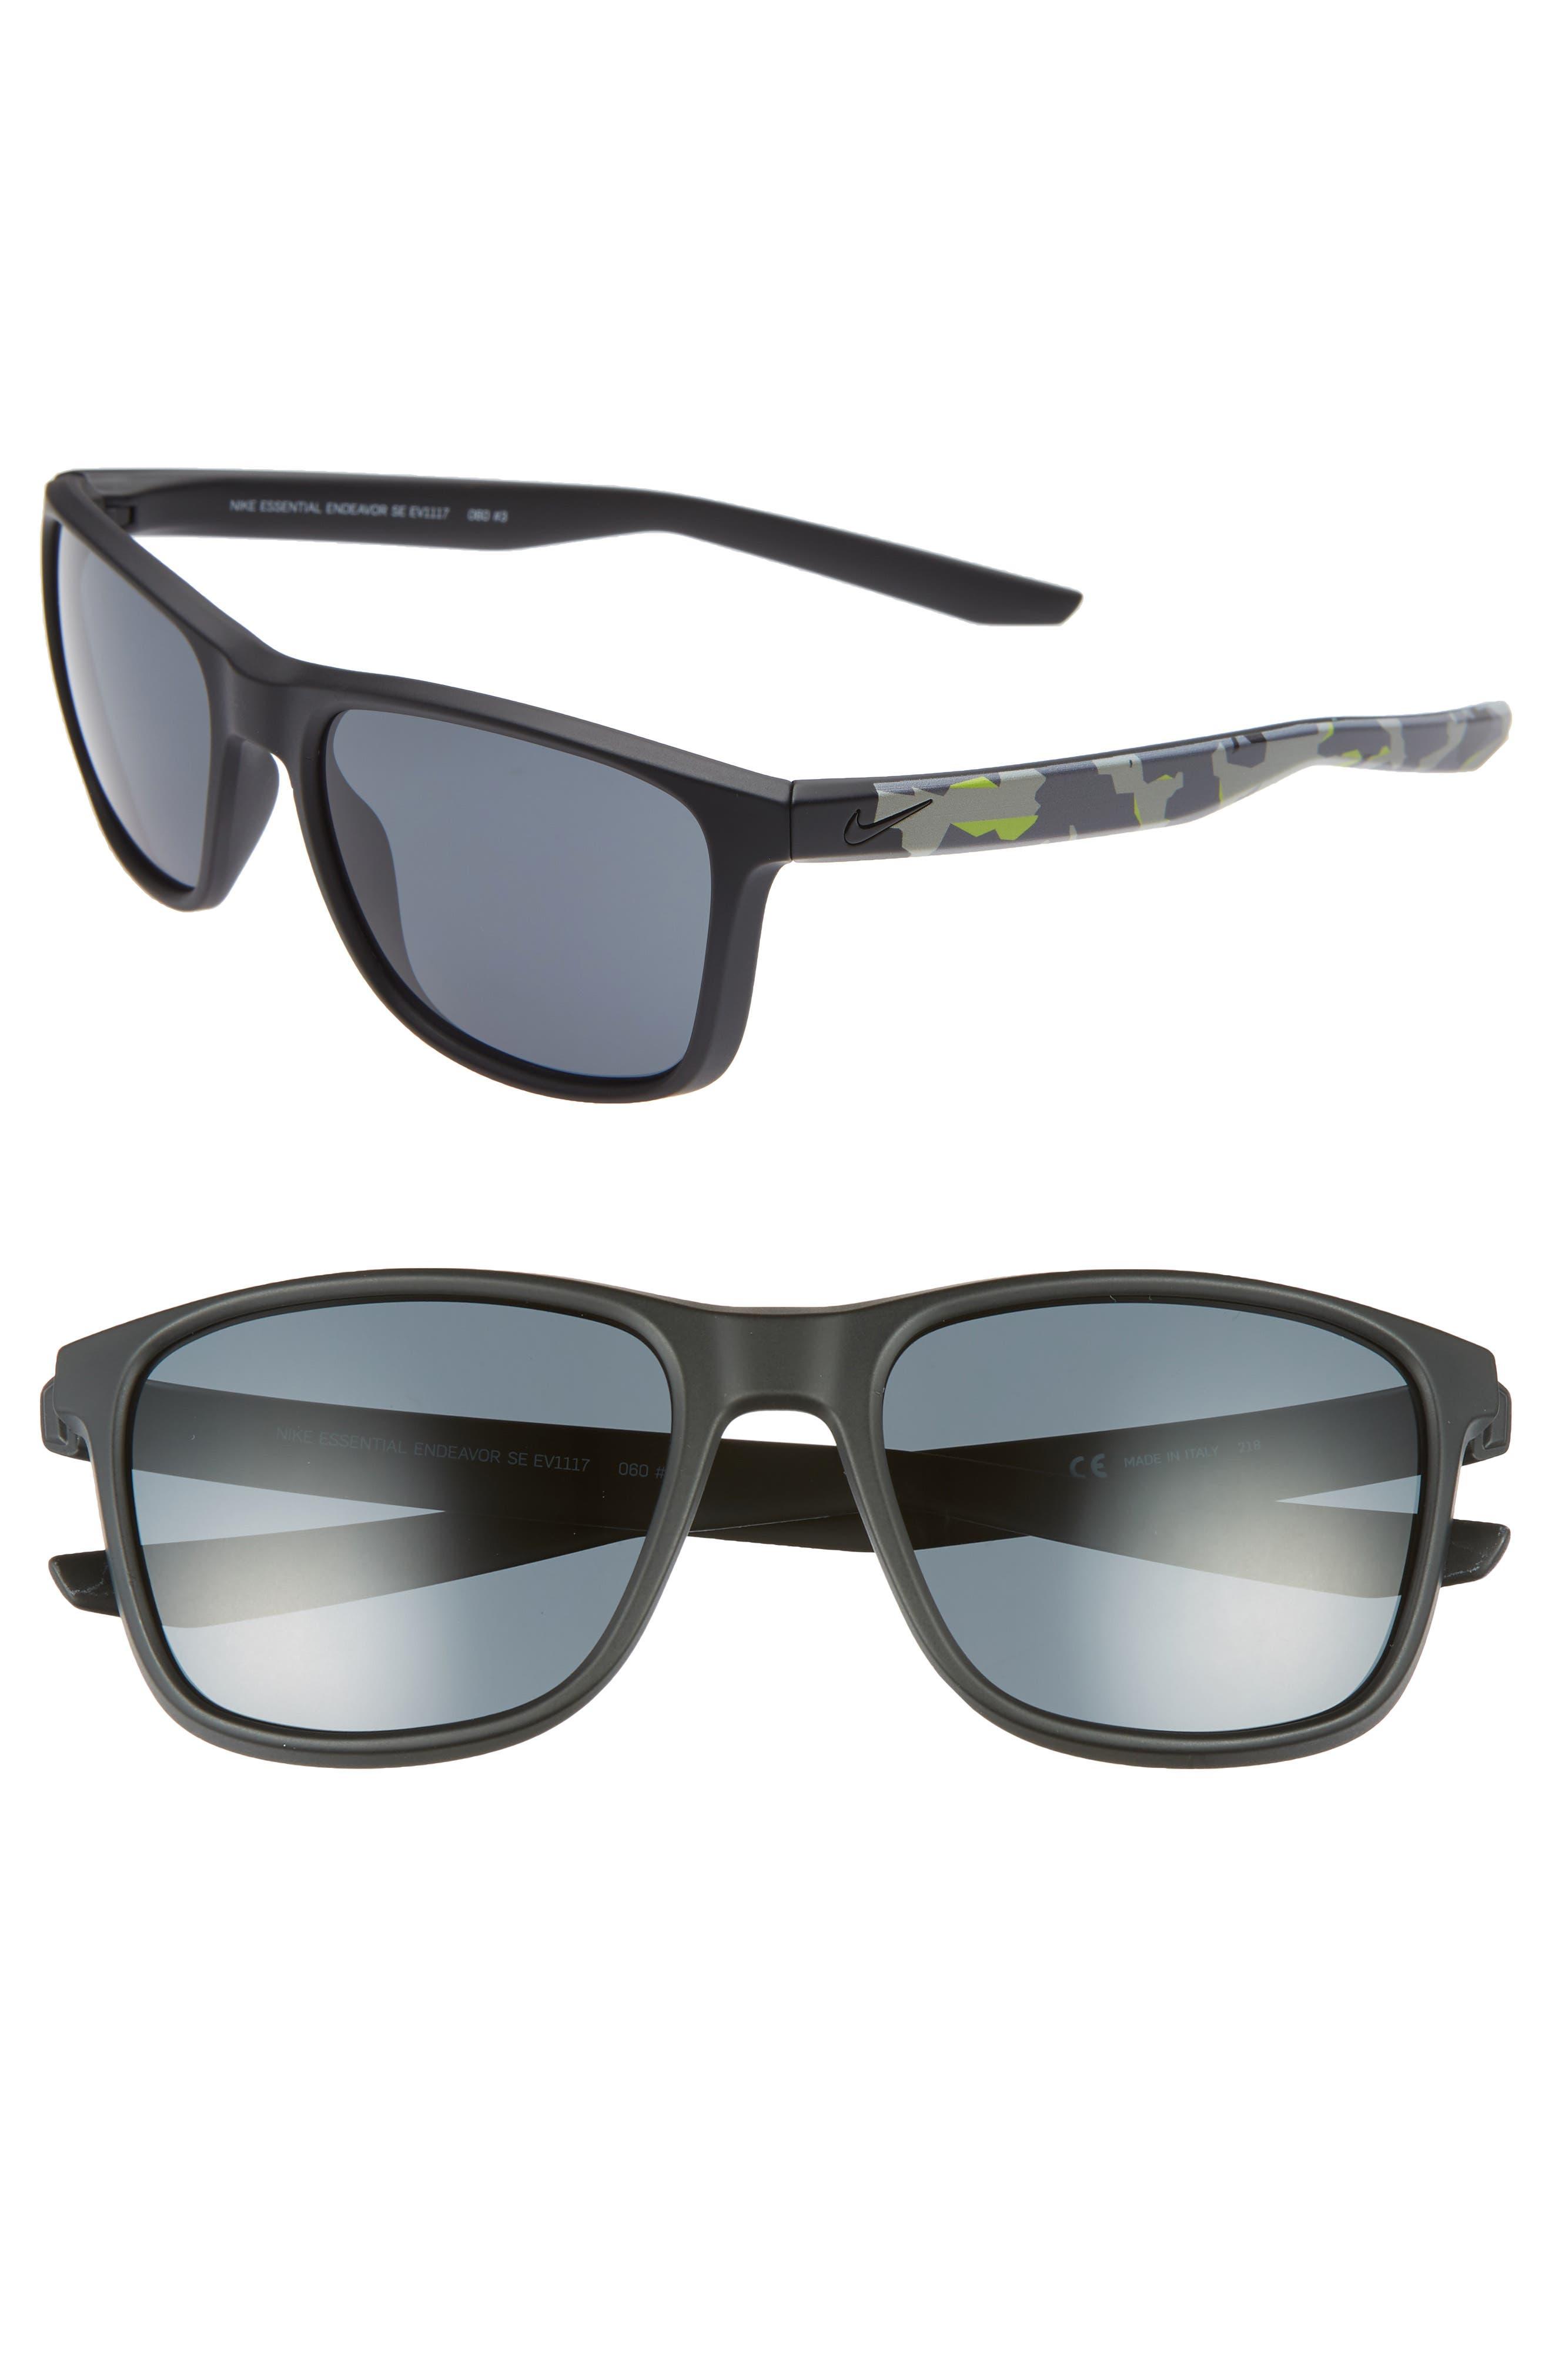 Nike Essential Endeavor 57Mm Square Sunglasses - Matte Black/ Dark Grey